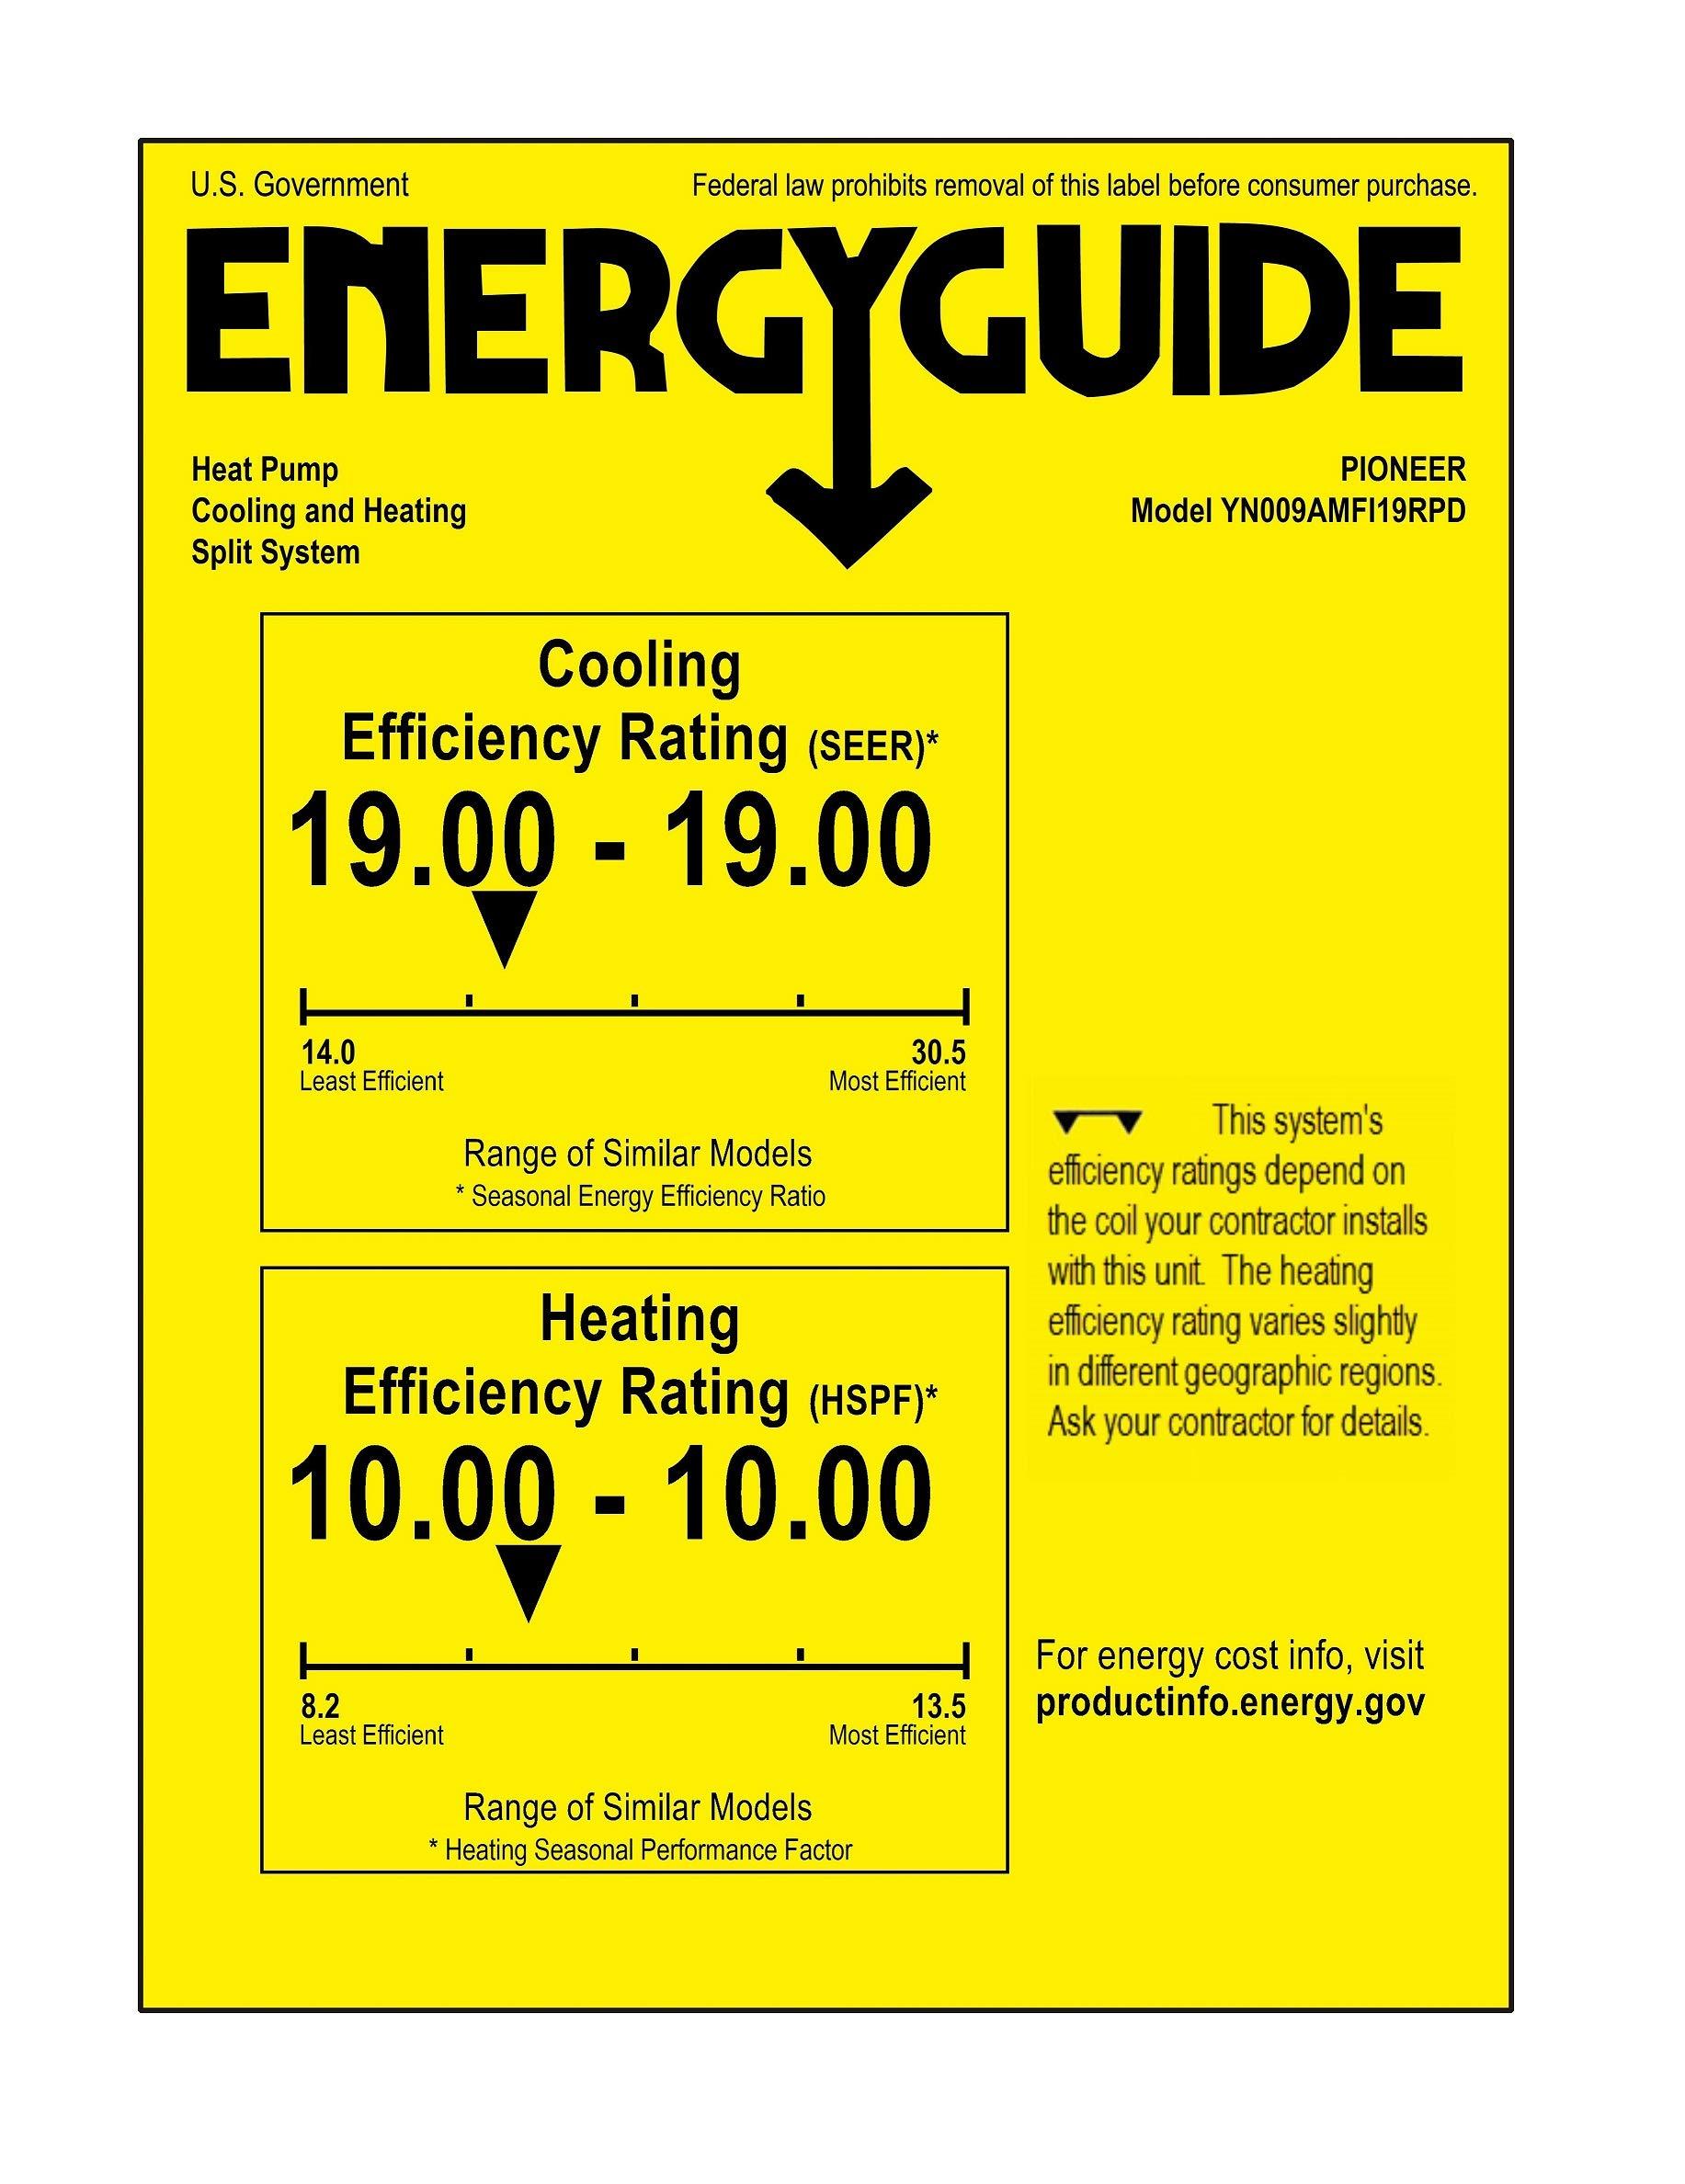 PIONEER Air Conditioner Pioneer Mini Split Minisplit Heatpump 9000 BTU-110/120 V 8 <p>Ultra high efficiency inverter+ ductless mini split heat pump system Cooling capacity: 9, 000 BTU/H with 17.0 SEER efficiency Heating capacity: 9, 500 BTU/H with 9.0 hspf efficiency Voltage: 110~120 VAC, 60 hertz (standard household power, l-n-g) Please see the active links on this page for full specks, manuals, etc</p>